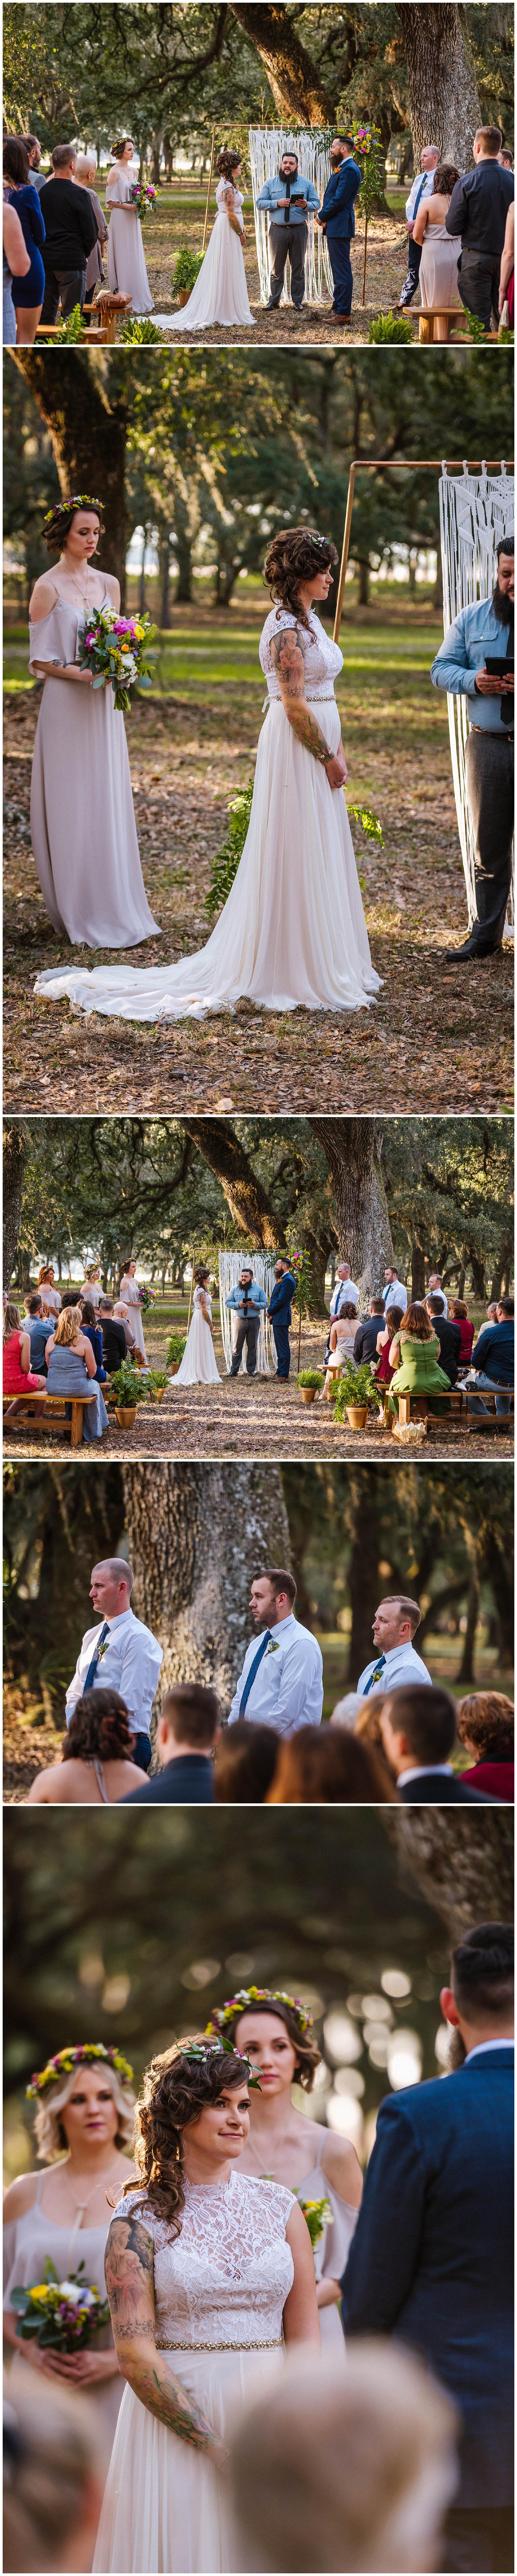 magical-outdoor-florida-wedding-smoke-bombs-flowers-crown-beard_0029.jpg